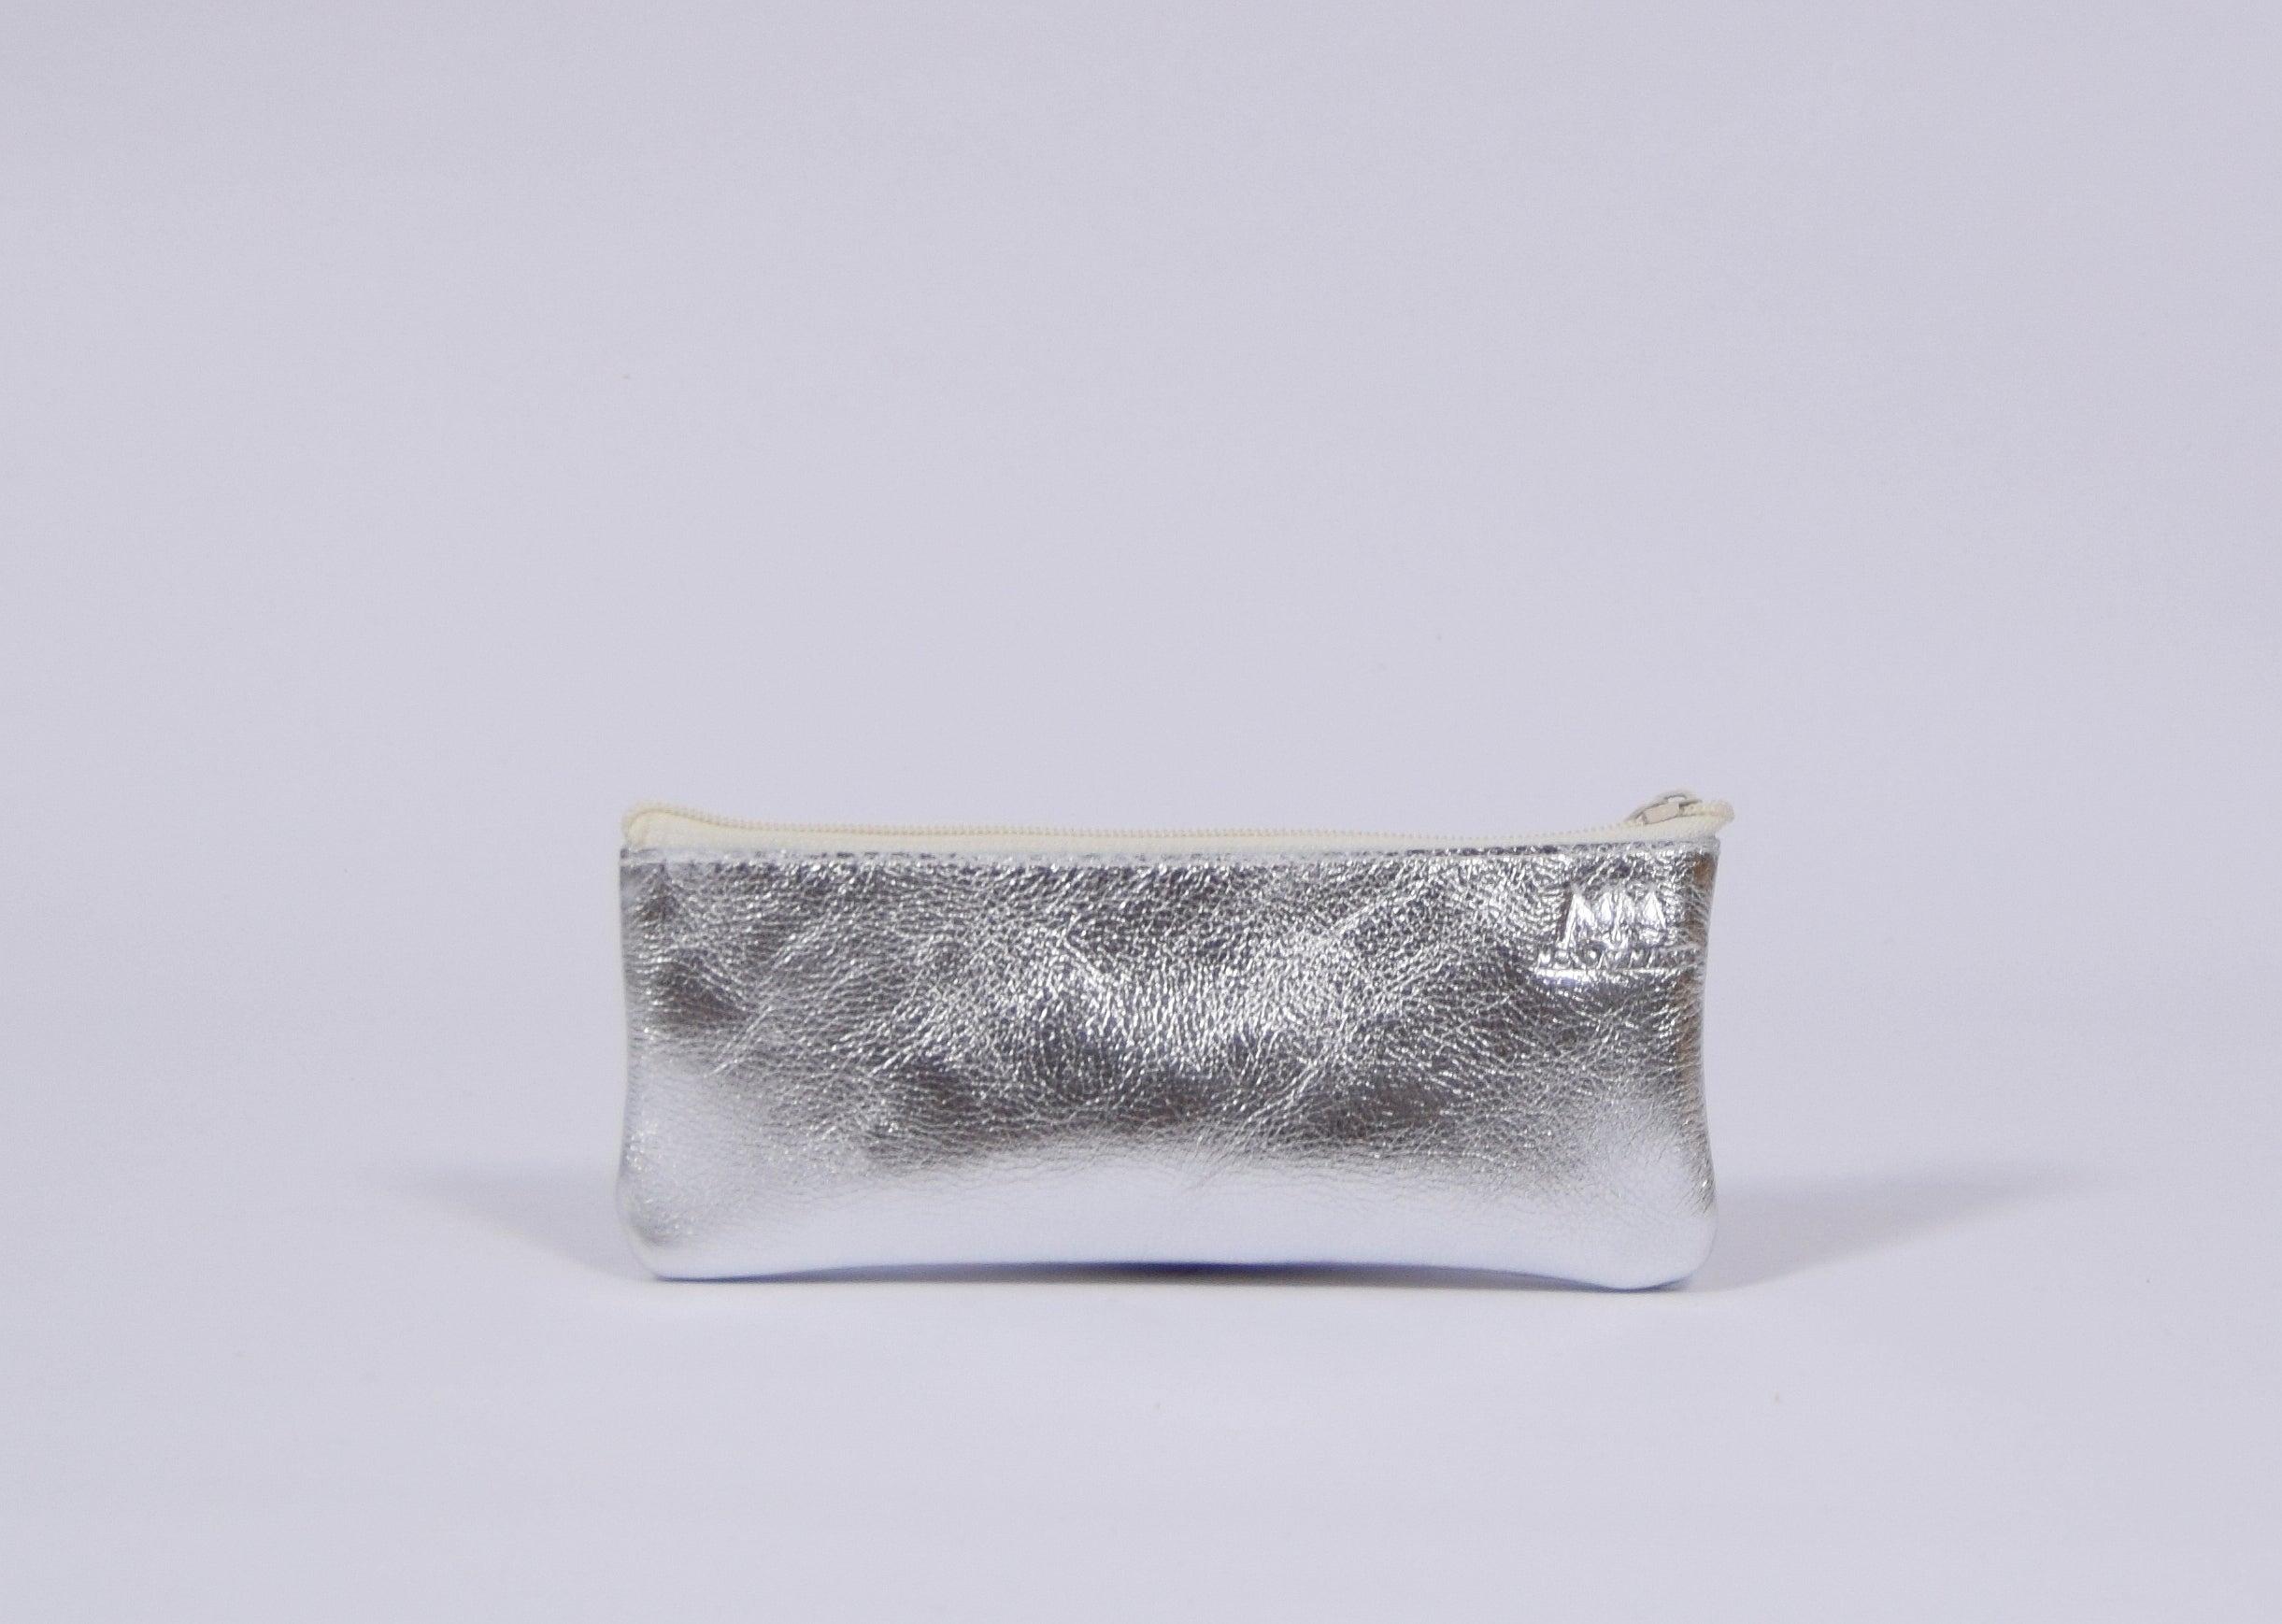 Silbernes Leder-Mäppchen